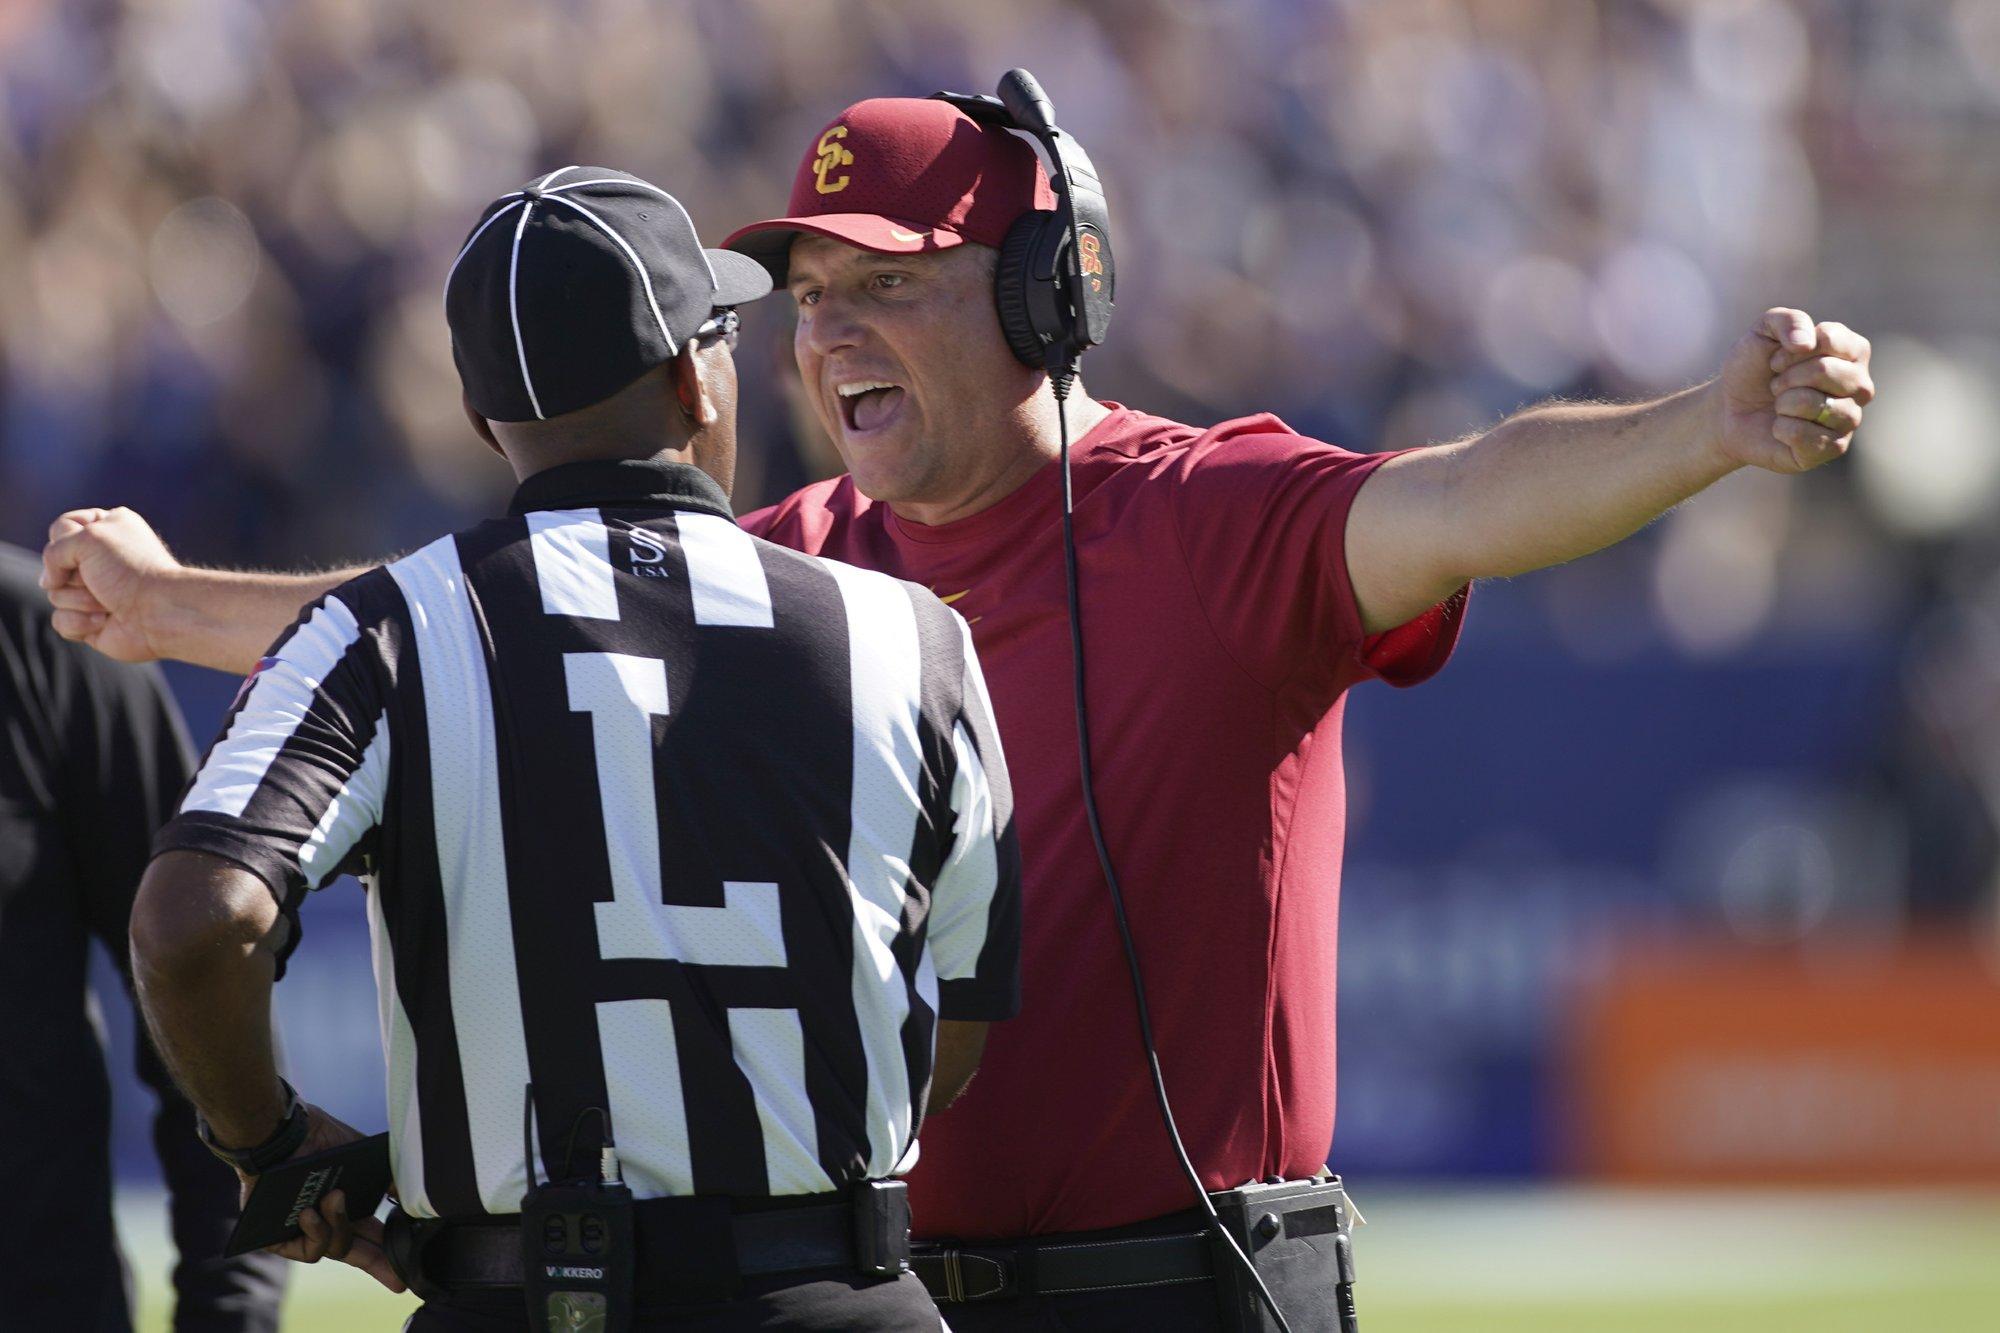 Big man's game: USC needs more from O-line vs. No. 10 Utah